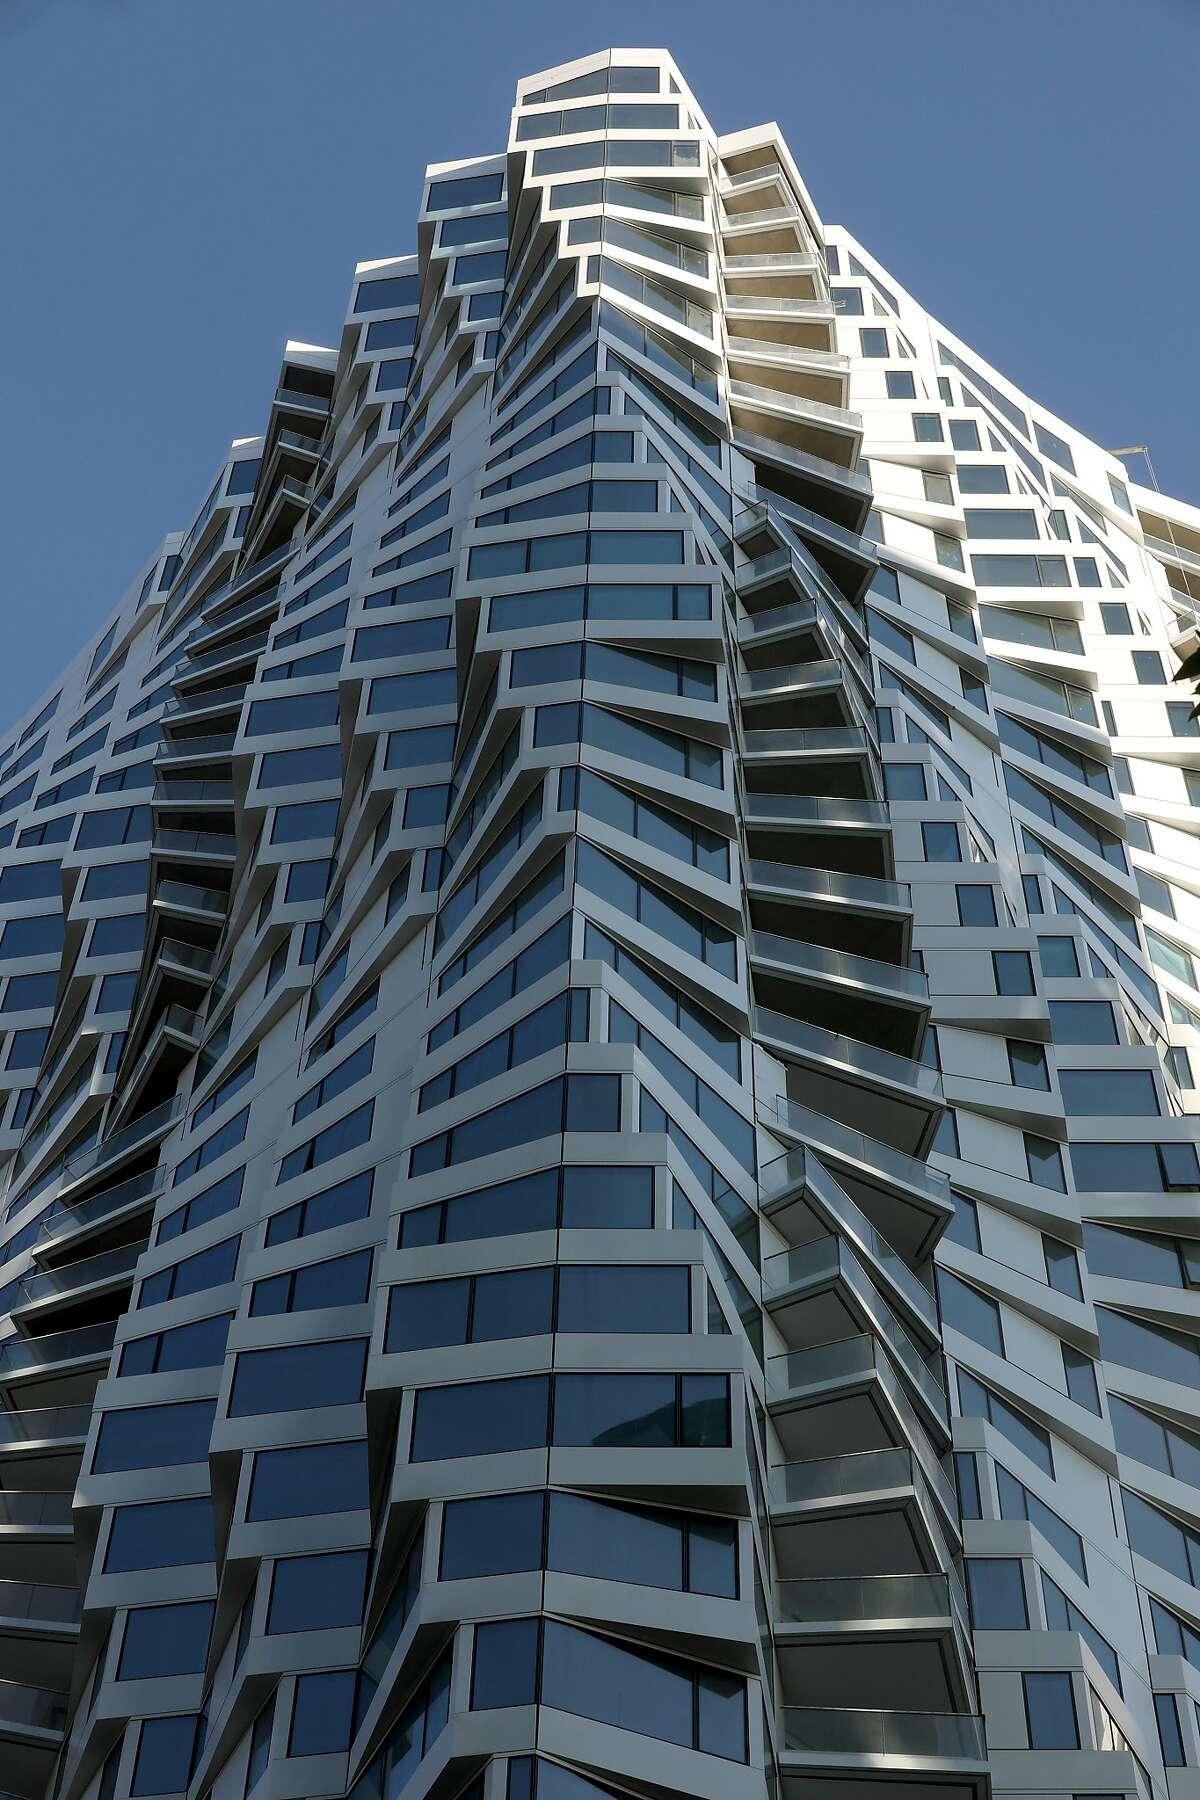 Mira condo tower at 160 Folsom St. seen on Friday, Oct. 25, 2019, in San Francisco, Calif.